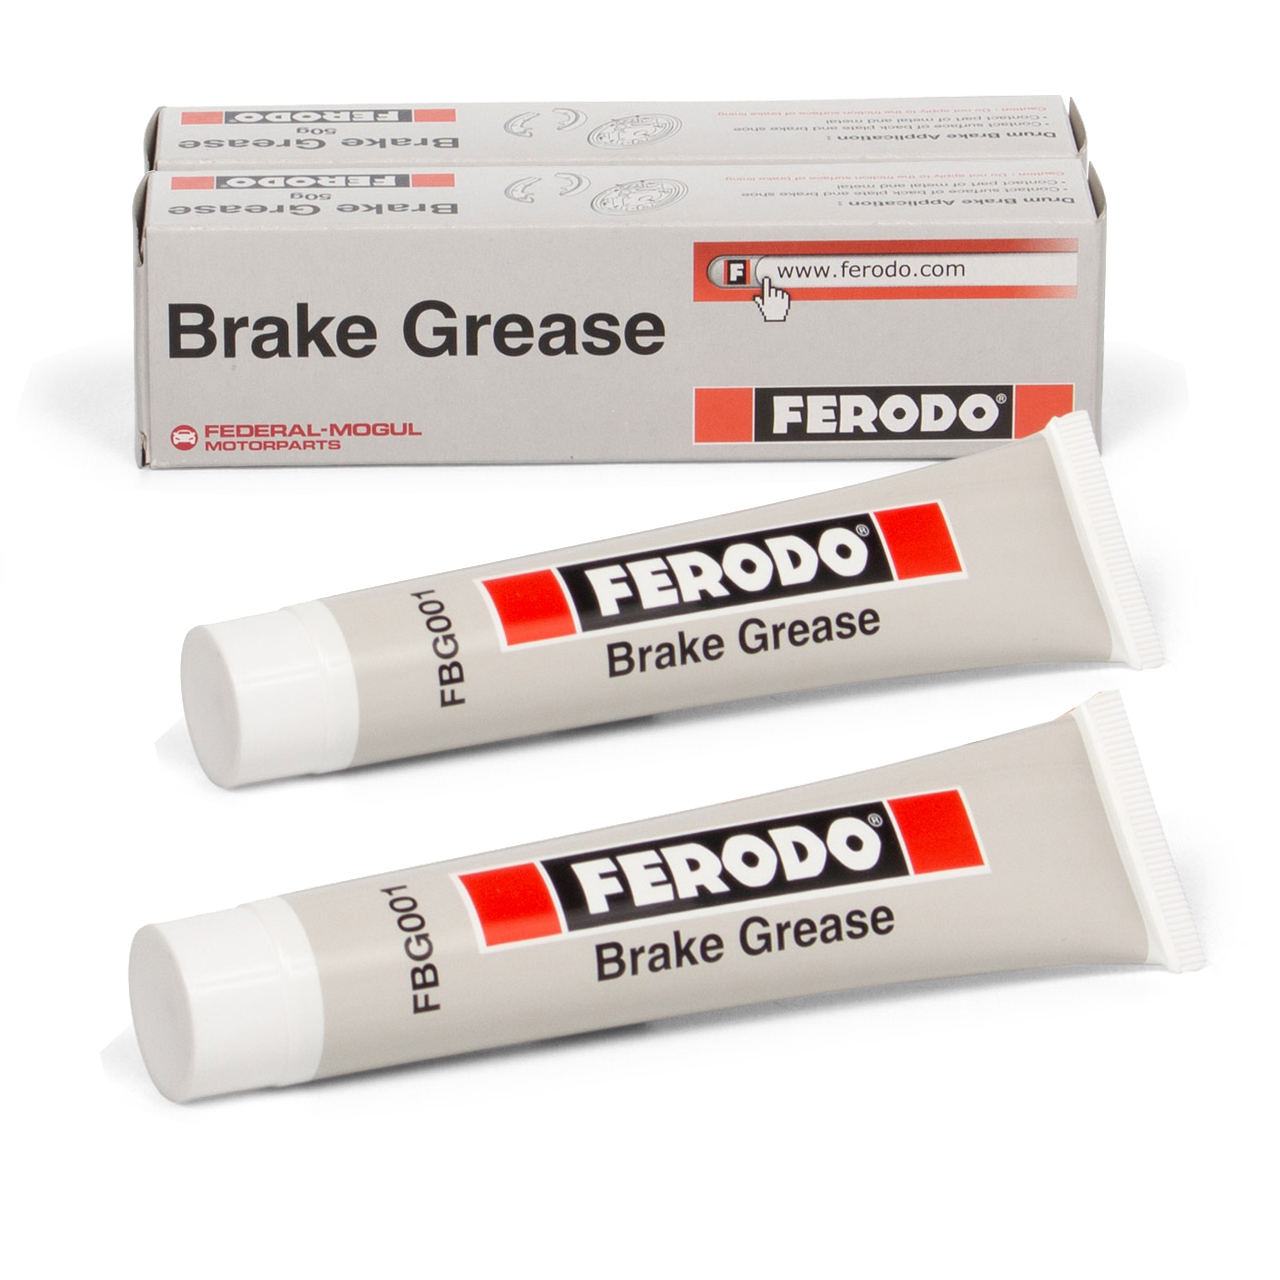 2x 75ml FERODO FBG001 BRAKE GREASE Bremsklotzpaste Bremsbelagpaste Montagepaste